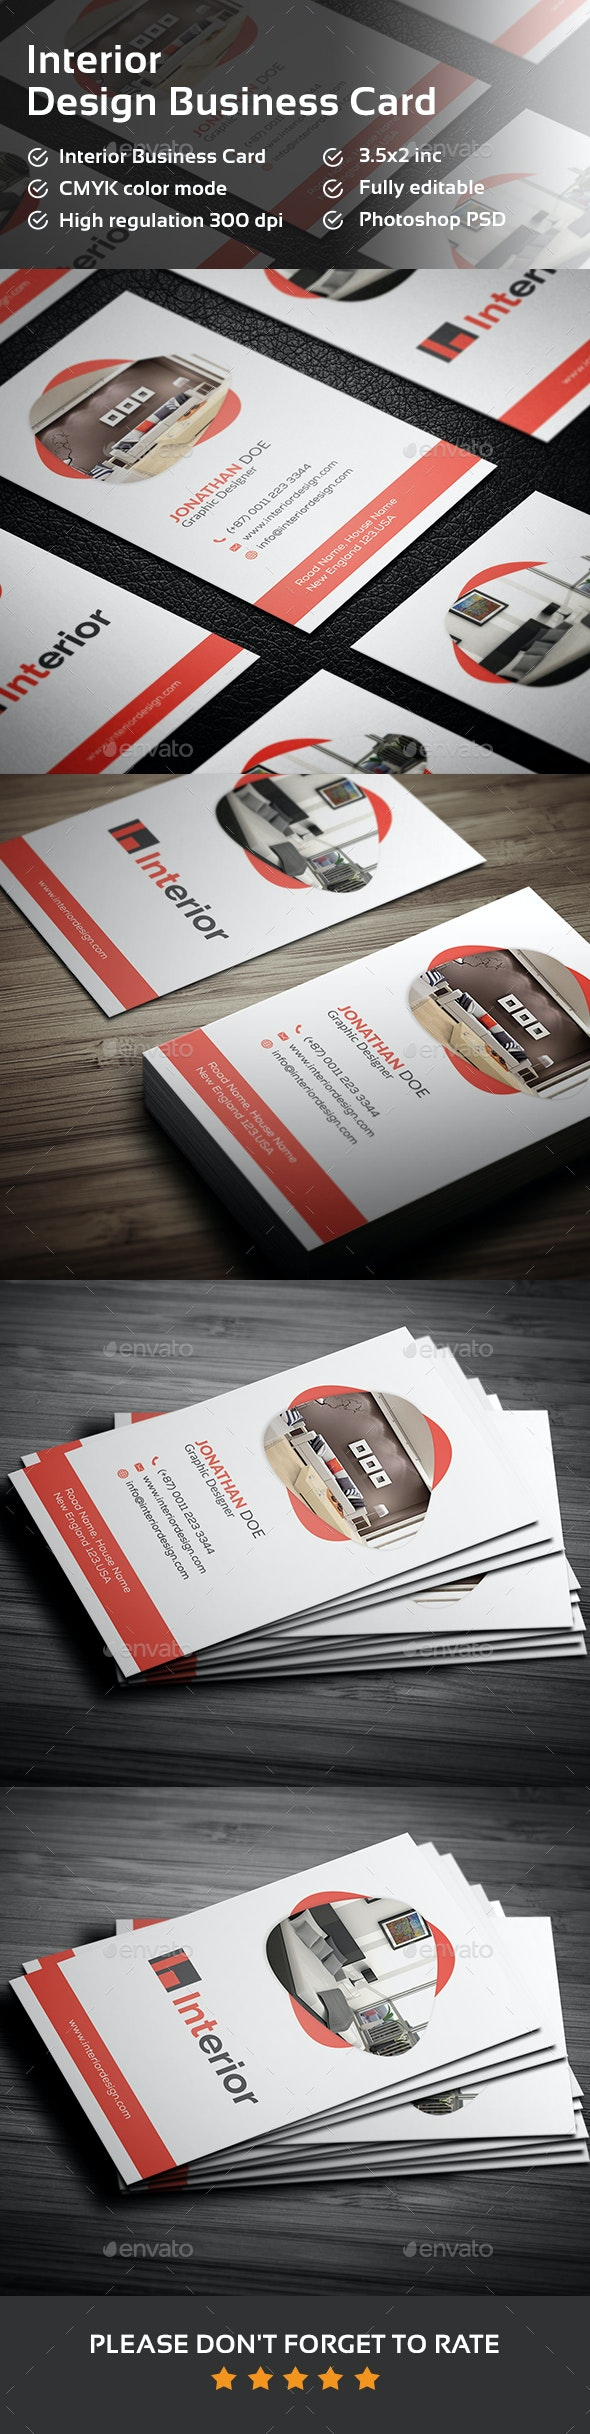 Interior Design Business Card - Creative Business Cards